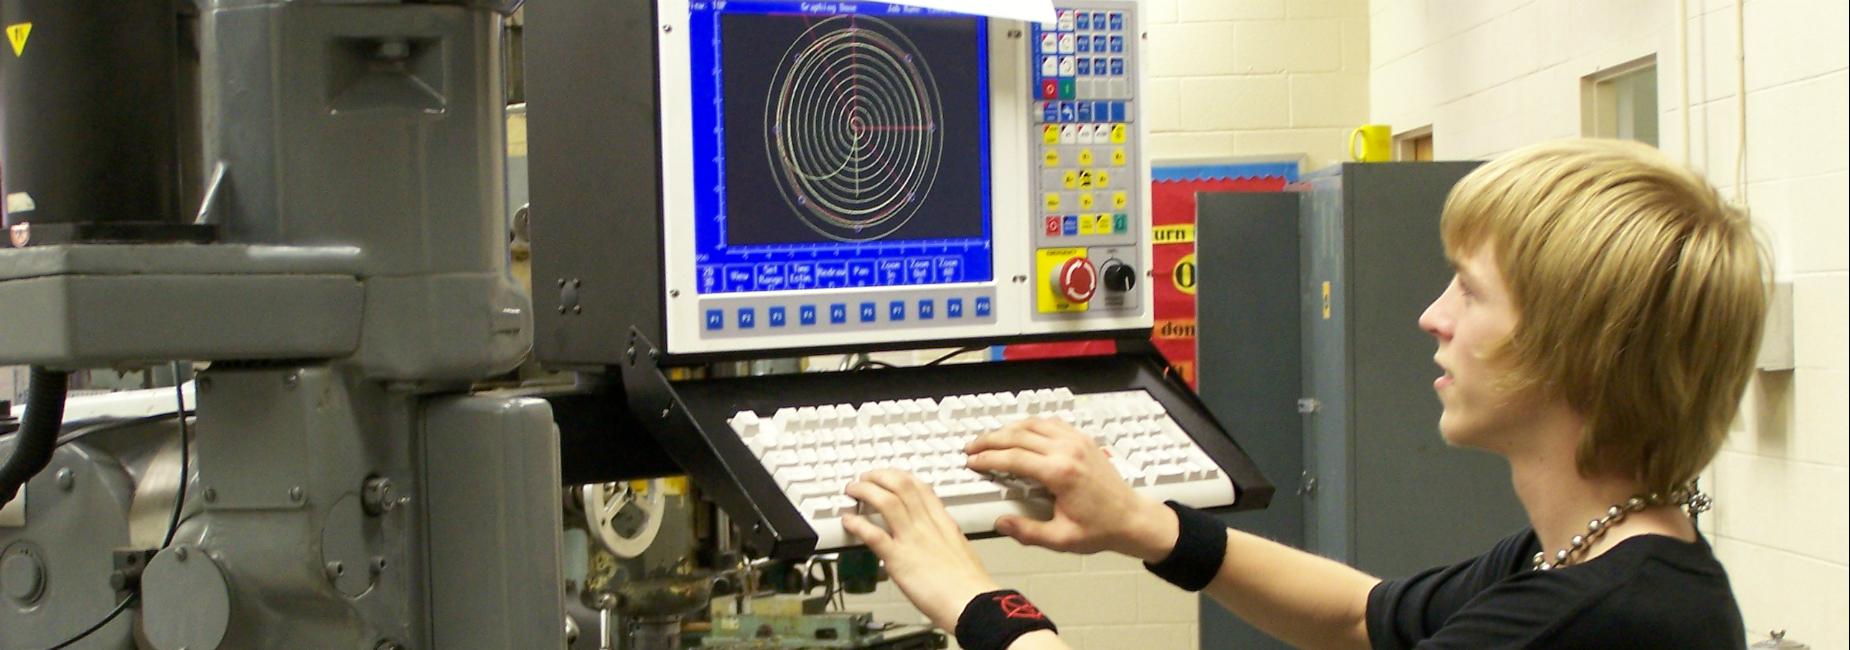 Smyth Career & Technology Center student using CNC machine.